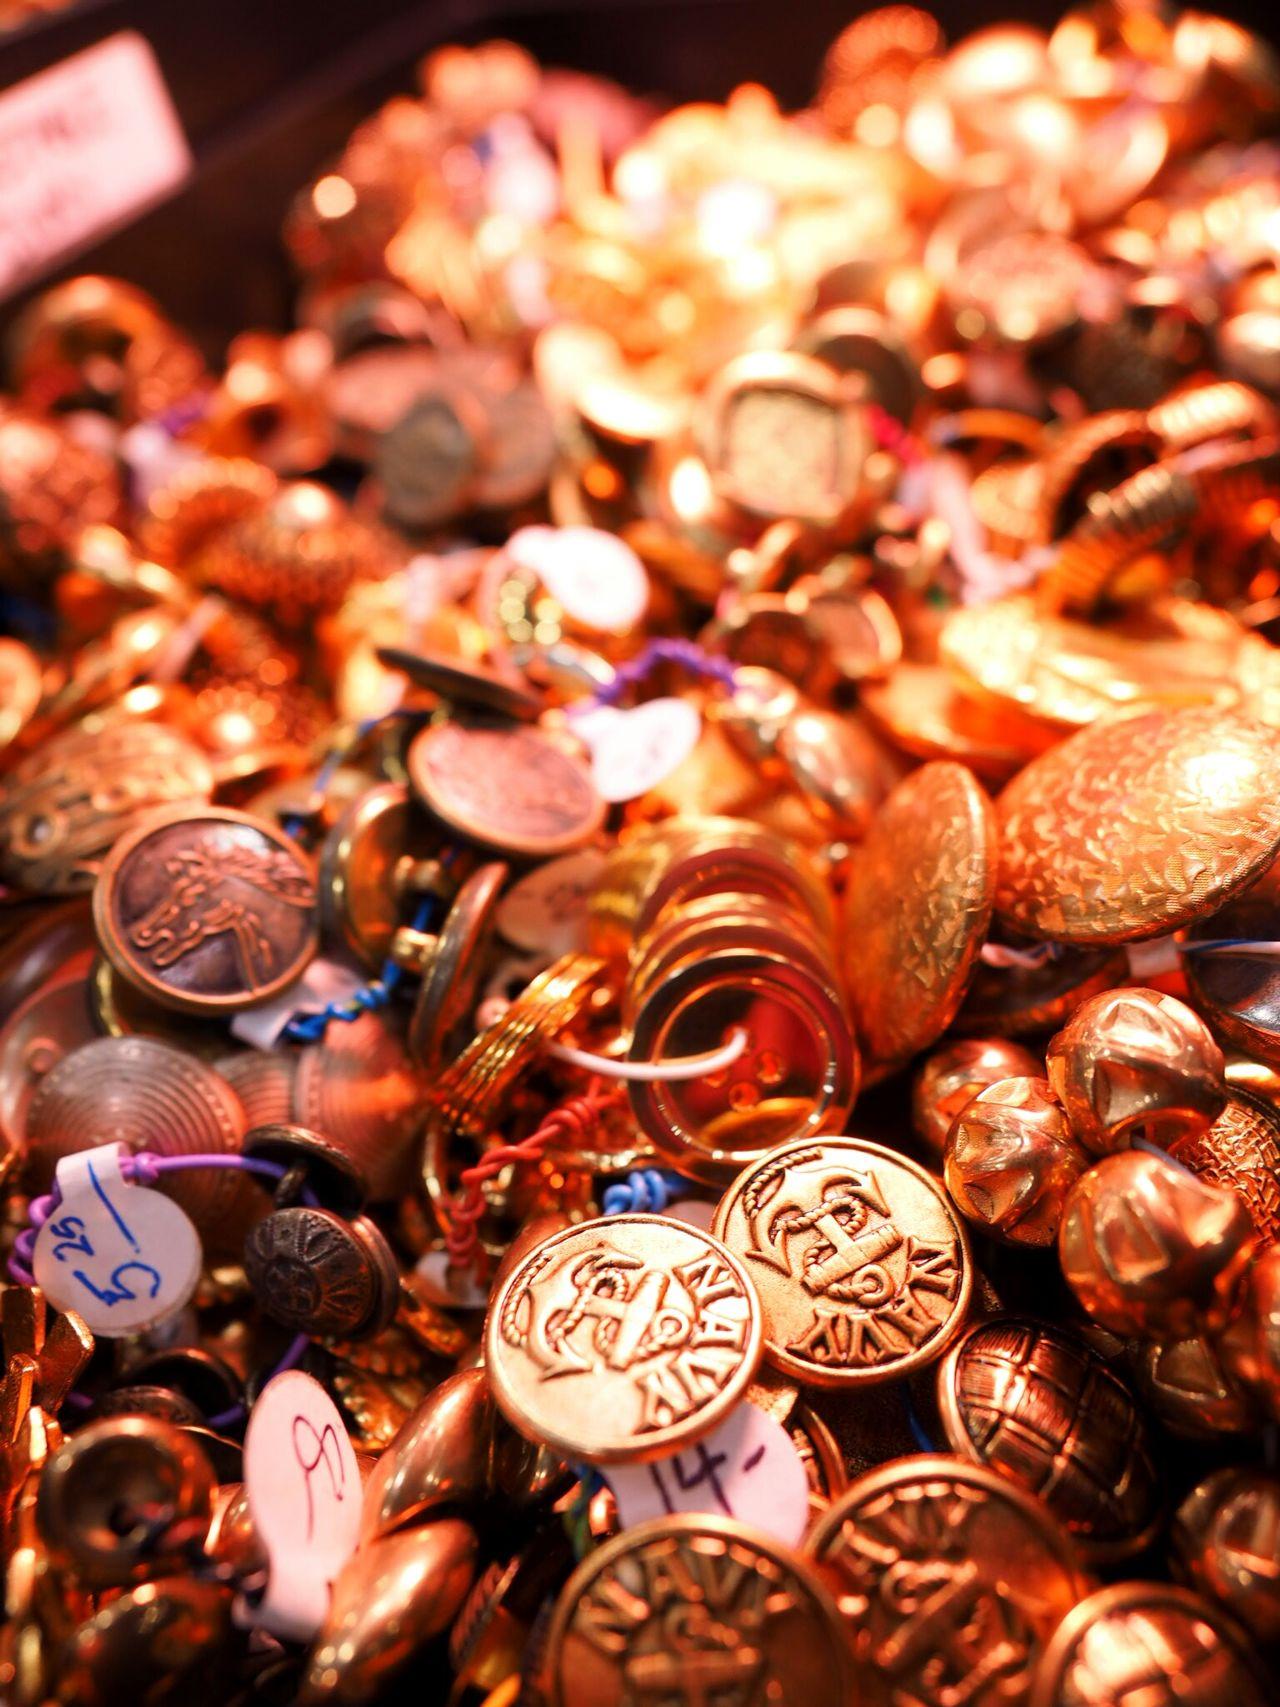 A bin full of gold buttons ... 43 Golden Moments Gold Buttons Navy Getolympus Zuiko Digital TravelOregon Portland, OR Olympus OM-D EM-1 Omdem1 Close-up